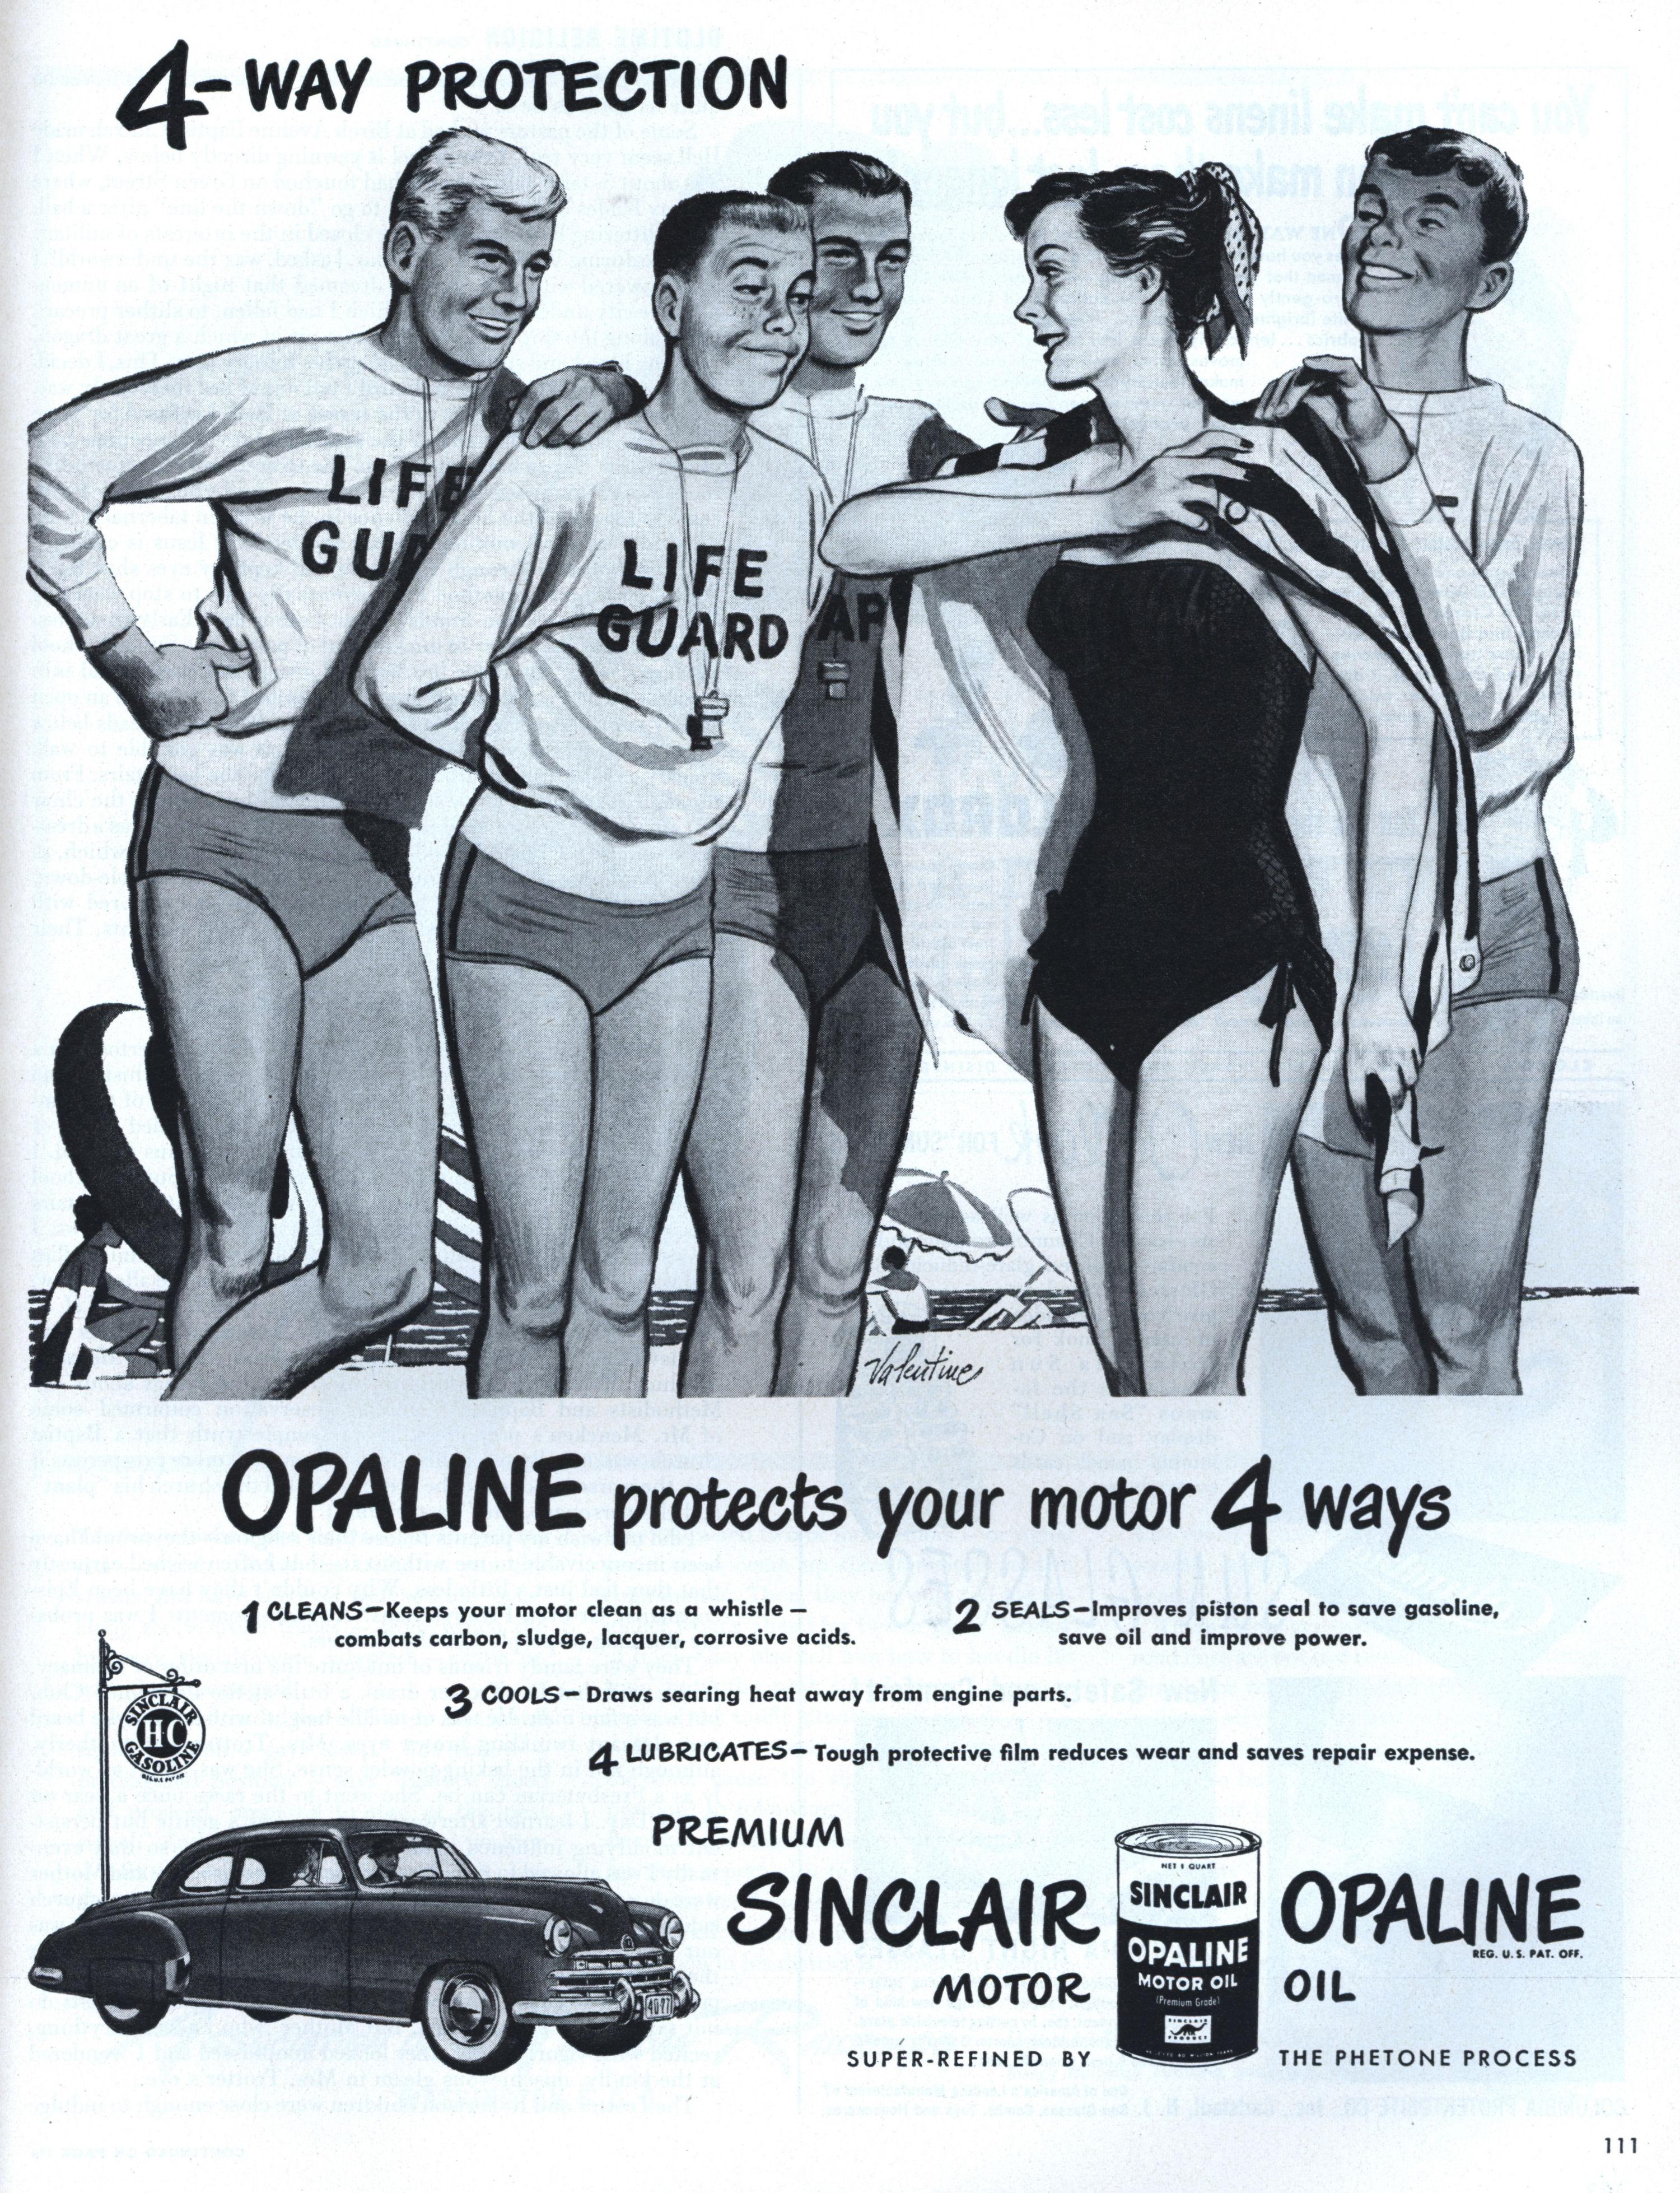 Sinclair Opaline